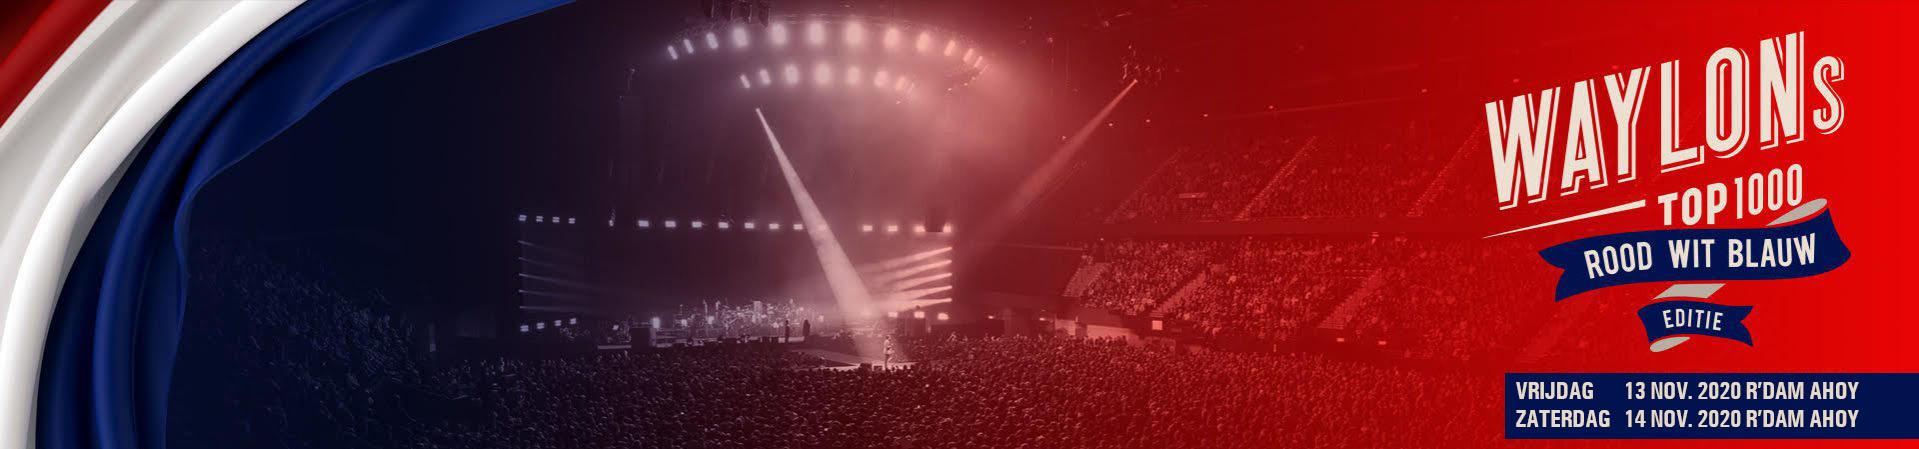 Waylon Live in Concert 1920x450